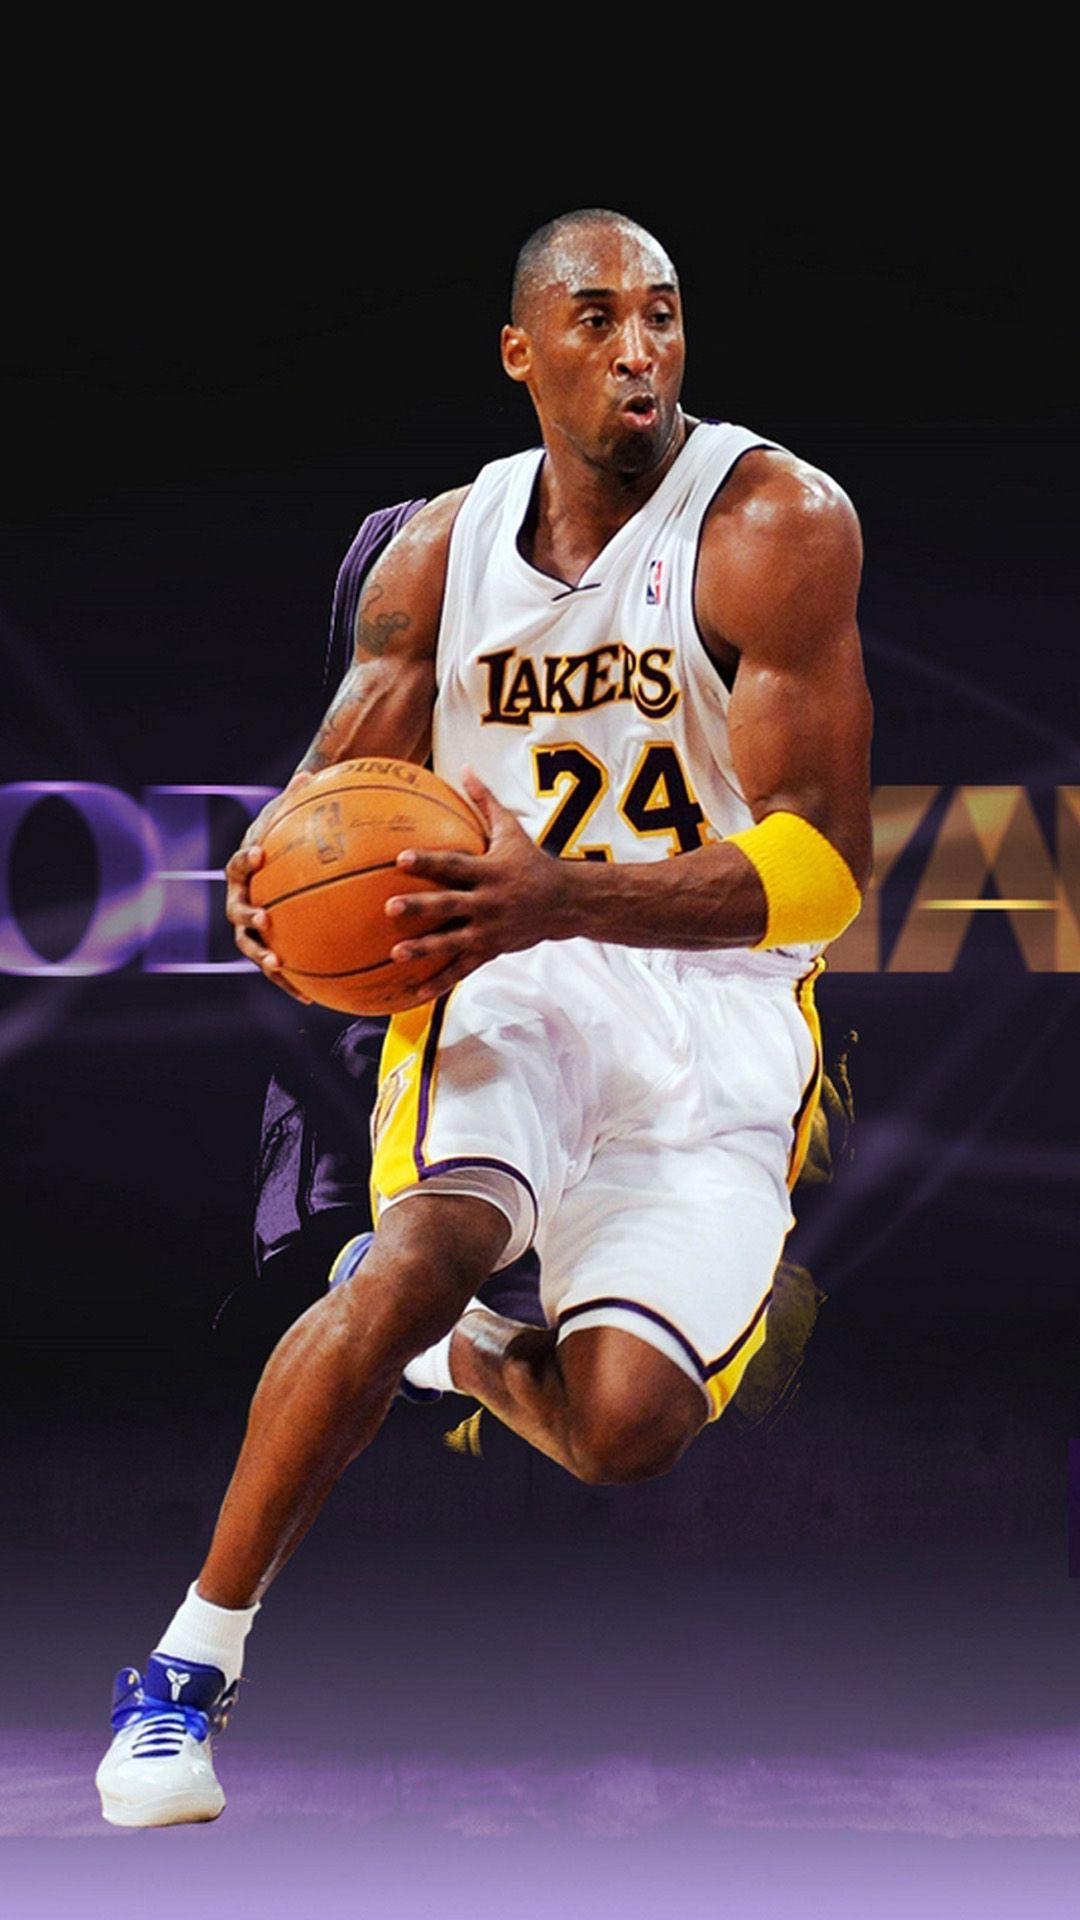 Kobe Bryant Nba Poster 2281394 Hd Wallpaper Backgrounds